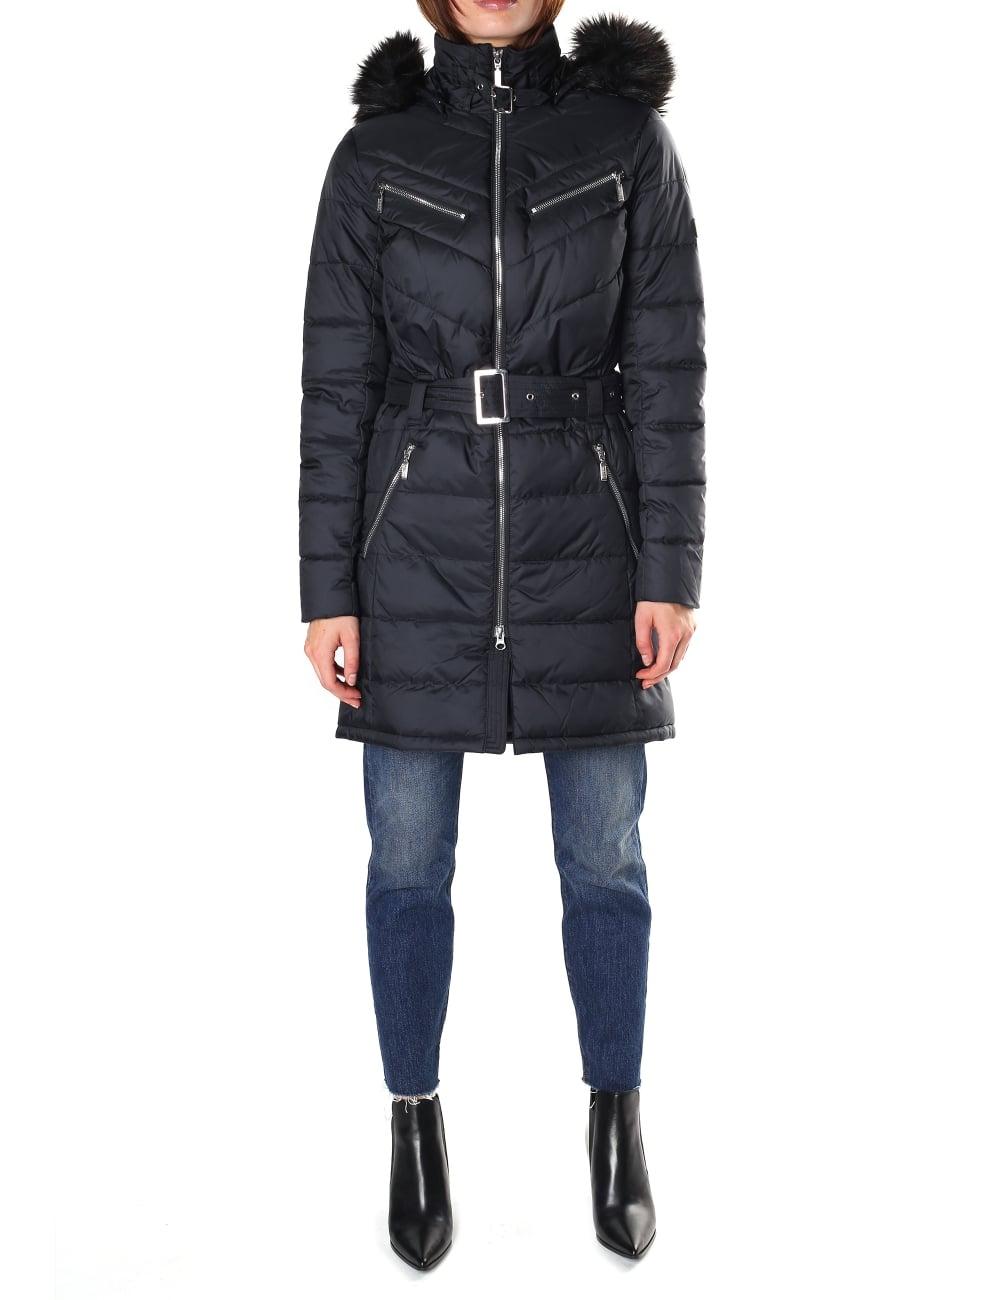 Barbour sale womens coats